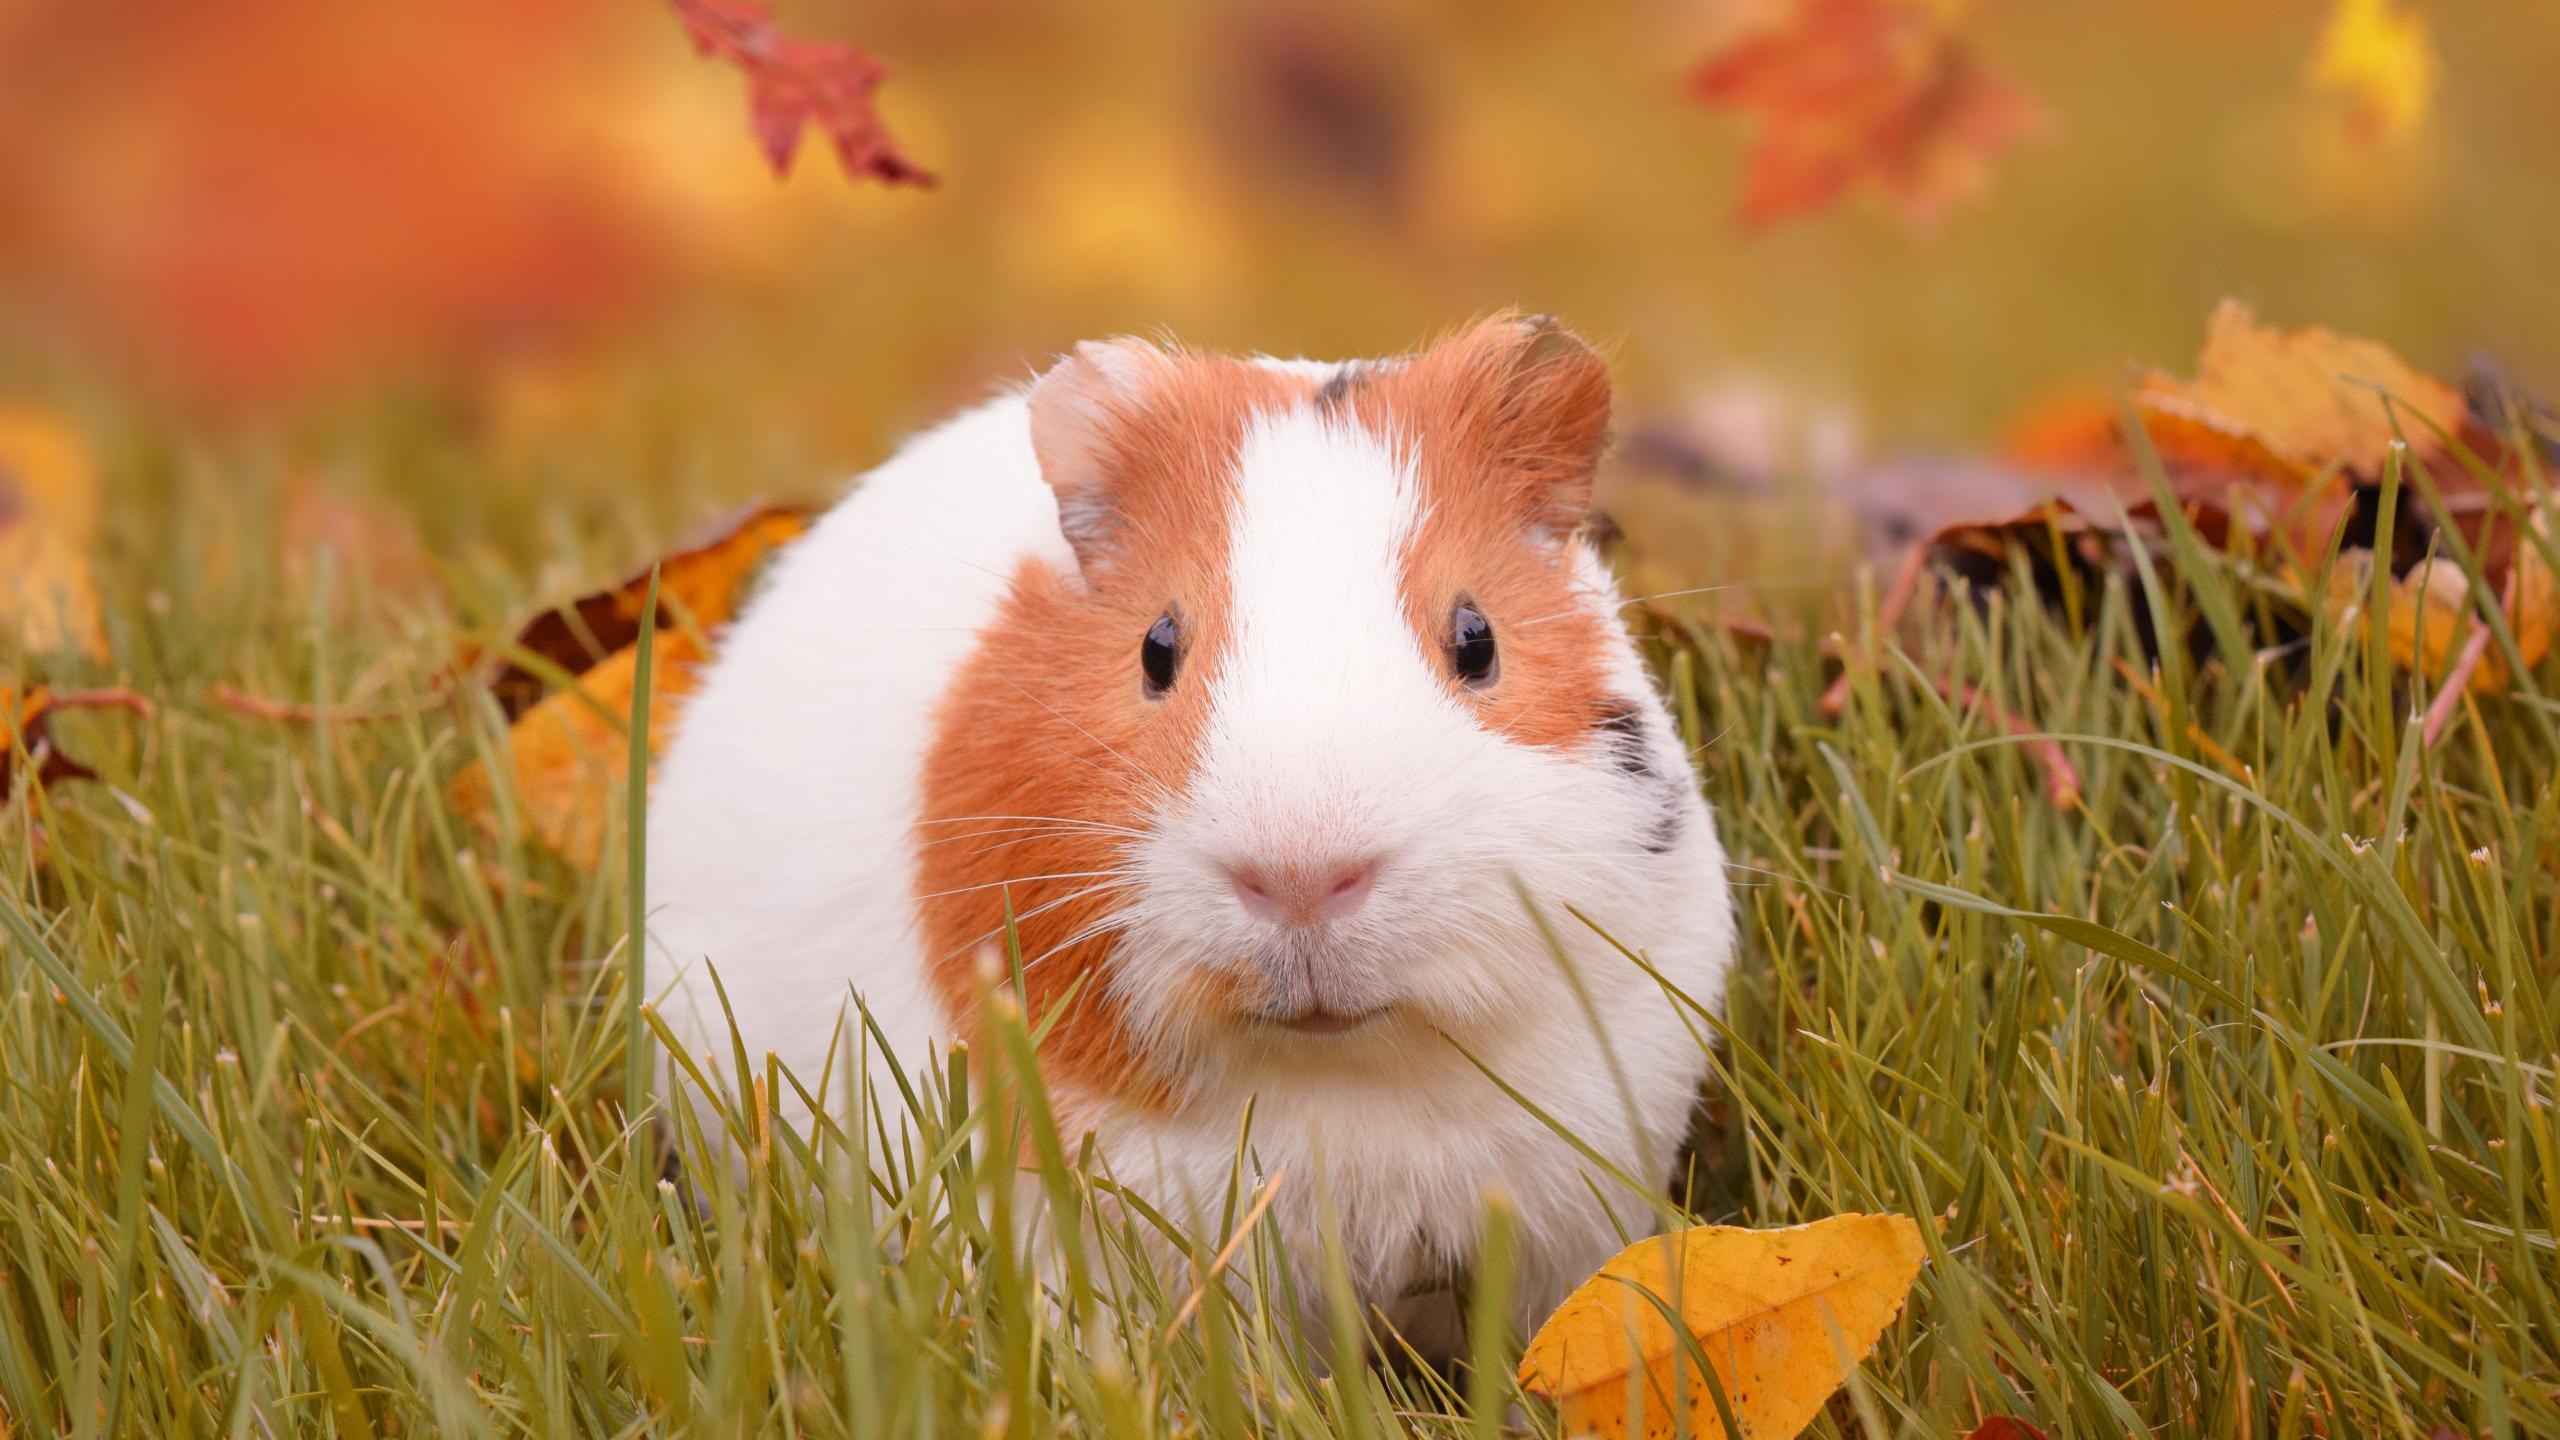 Download 2560x1440 Wallpaper Cute, Rodent, Guinea Pig, 5k